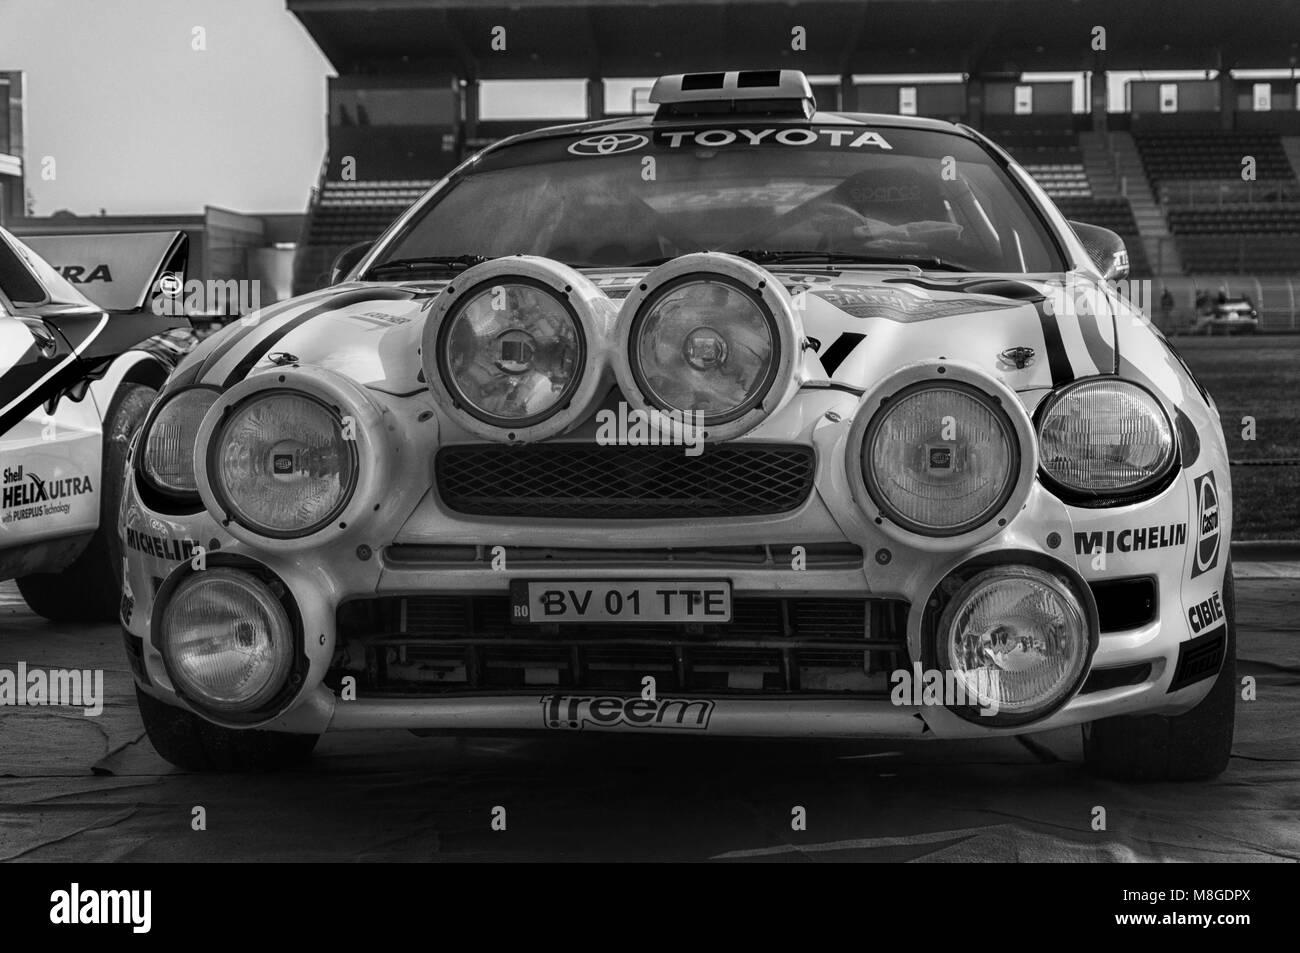 SANMARINO, SANMARINO - OTT 21, 2017 : TOYOTA CELICA GT4 - ST205 1995 in old racing car rally THE LEGEND 2017 the - Stock Image